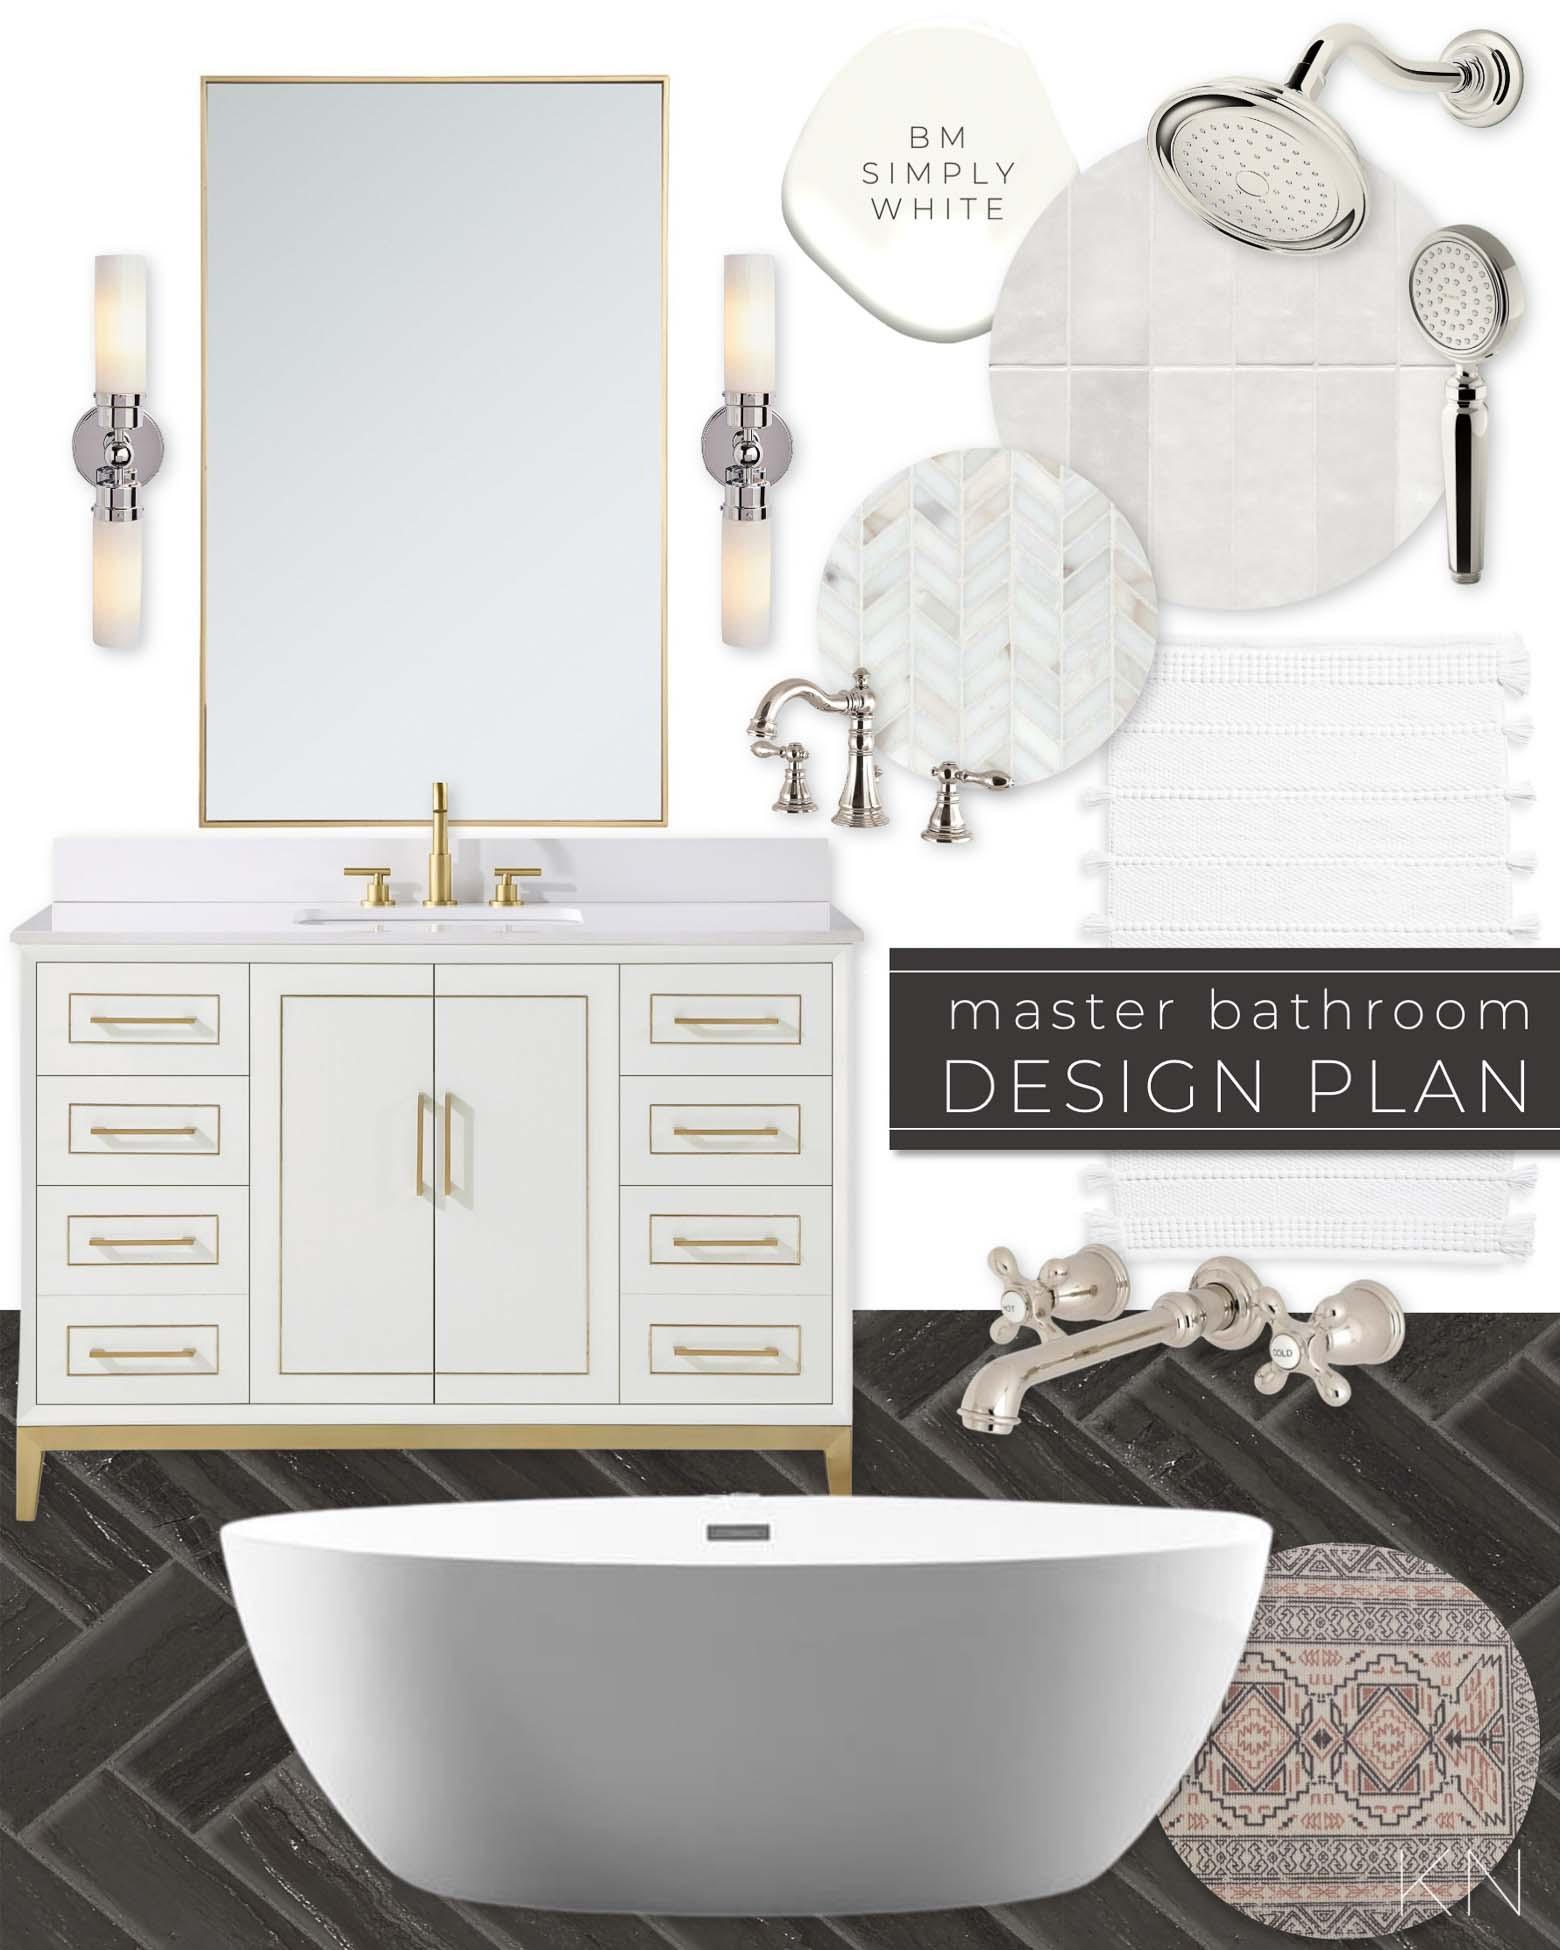 Elegant Transitional Bathroom Design Plan and Decor Ideas